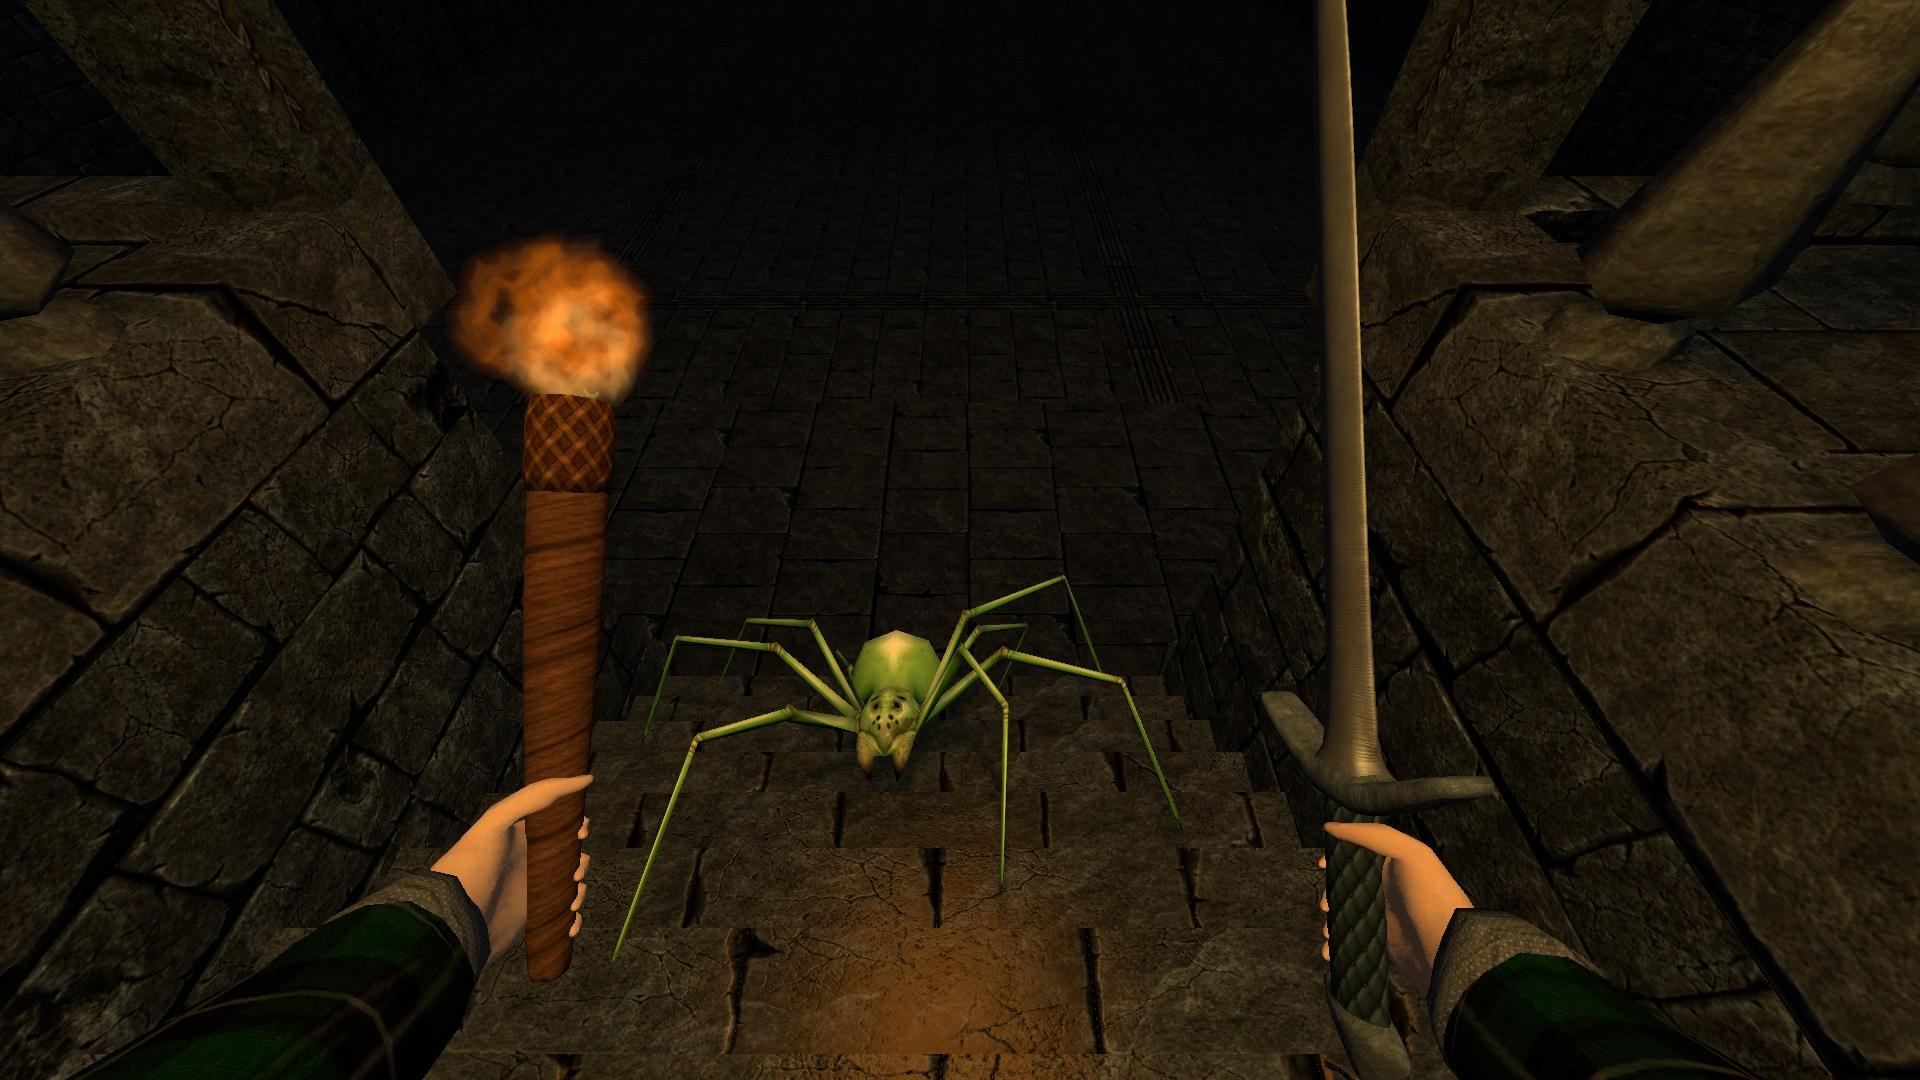 CT091 Sword SpiderOnStairs